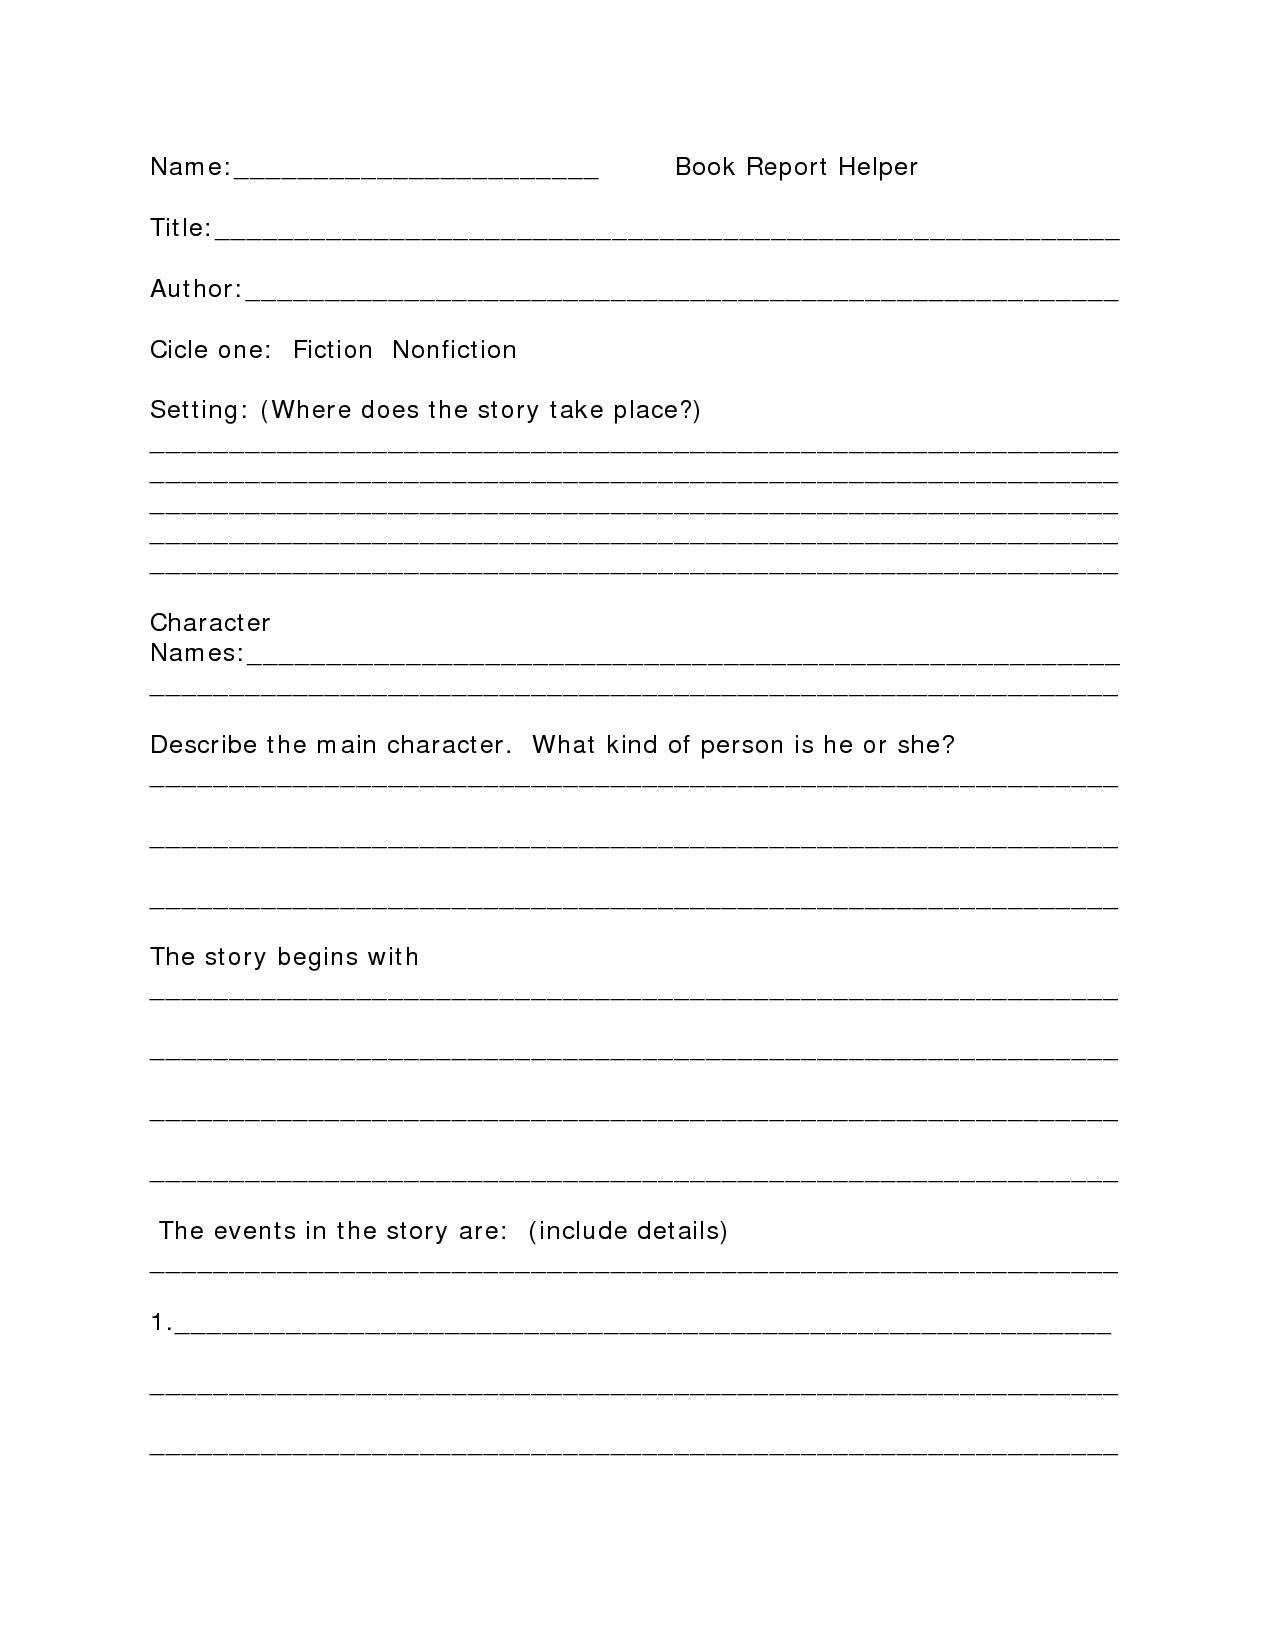 High School Book Report Outline  Name Book Report Helper Title